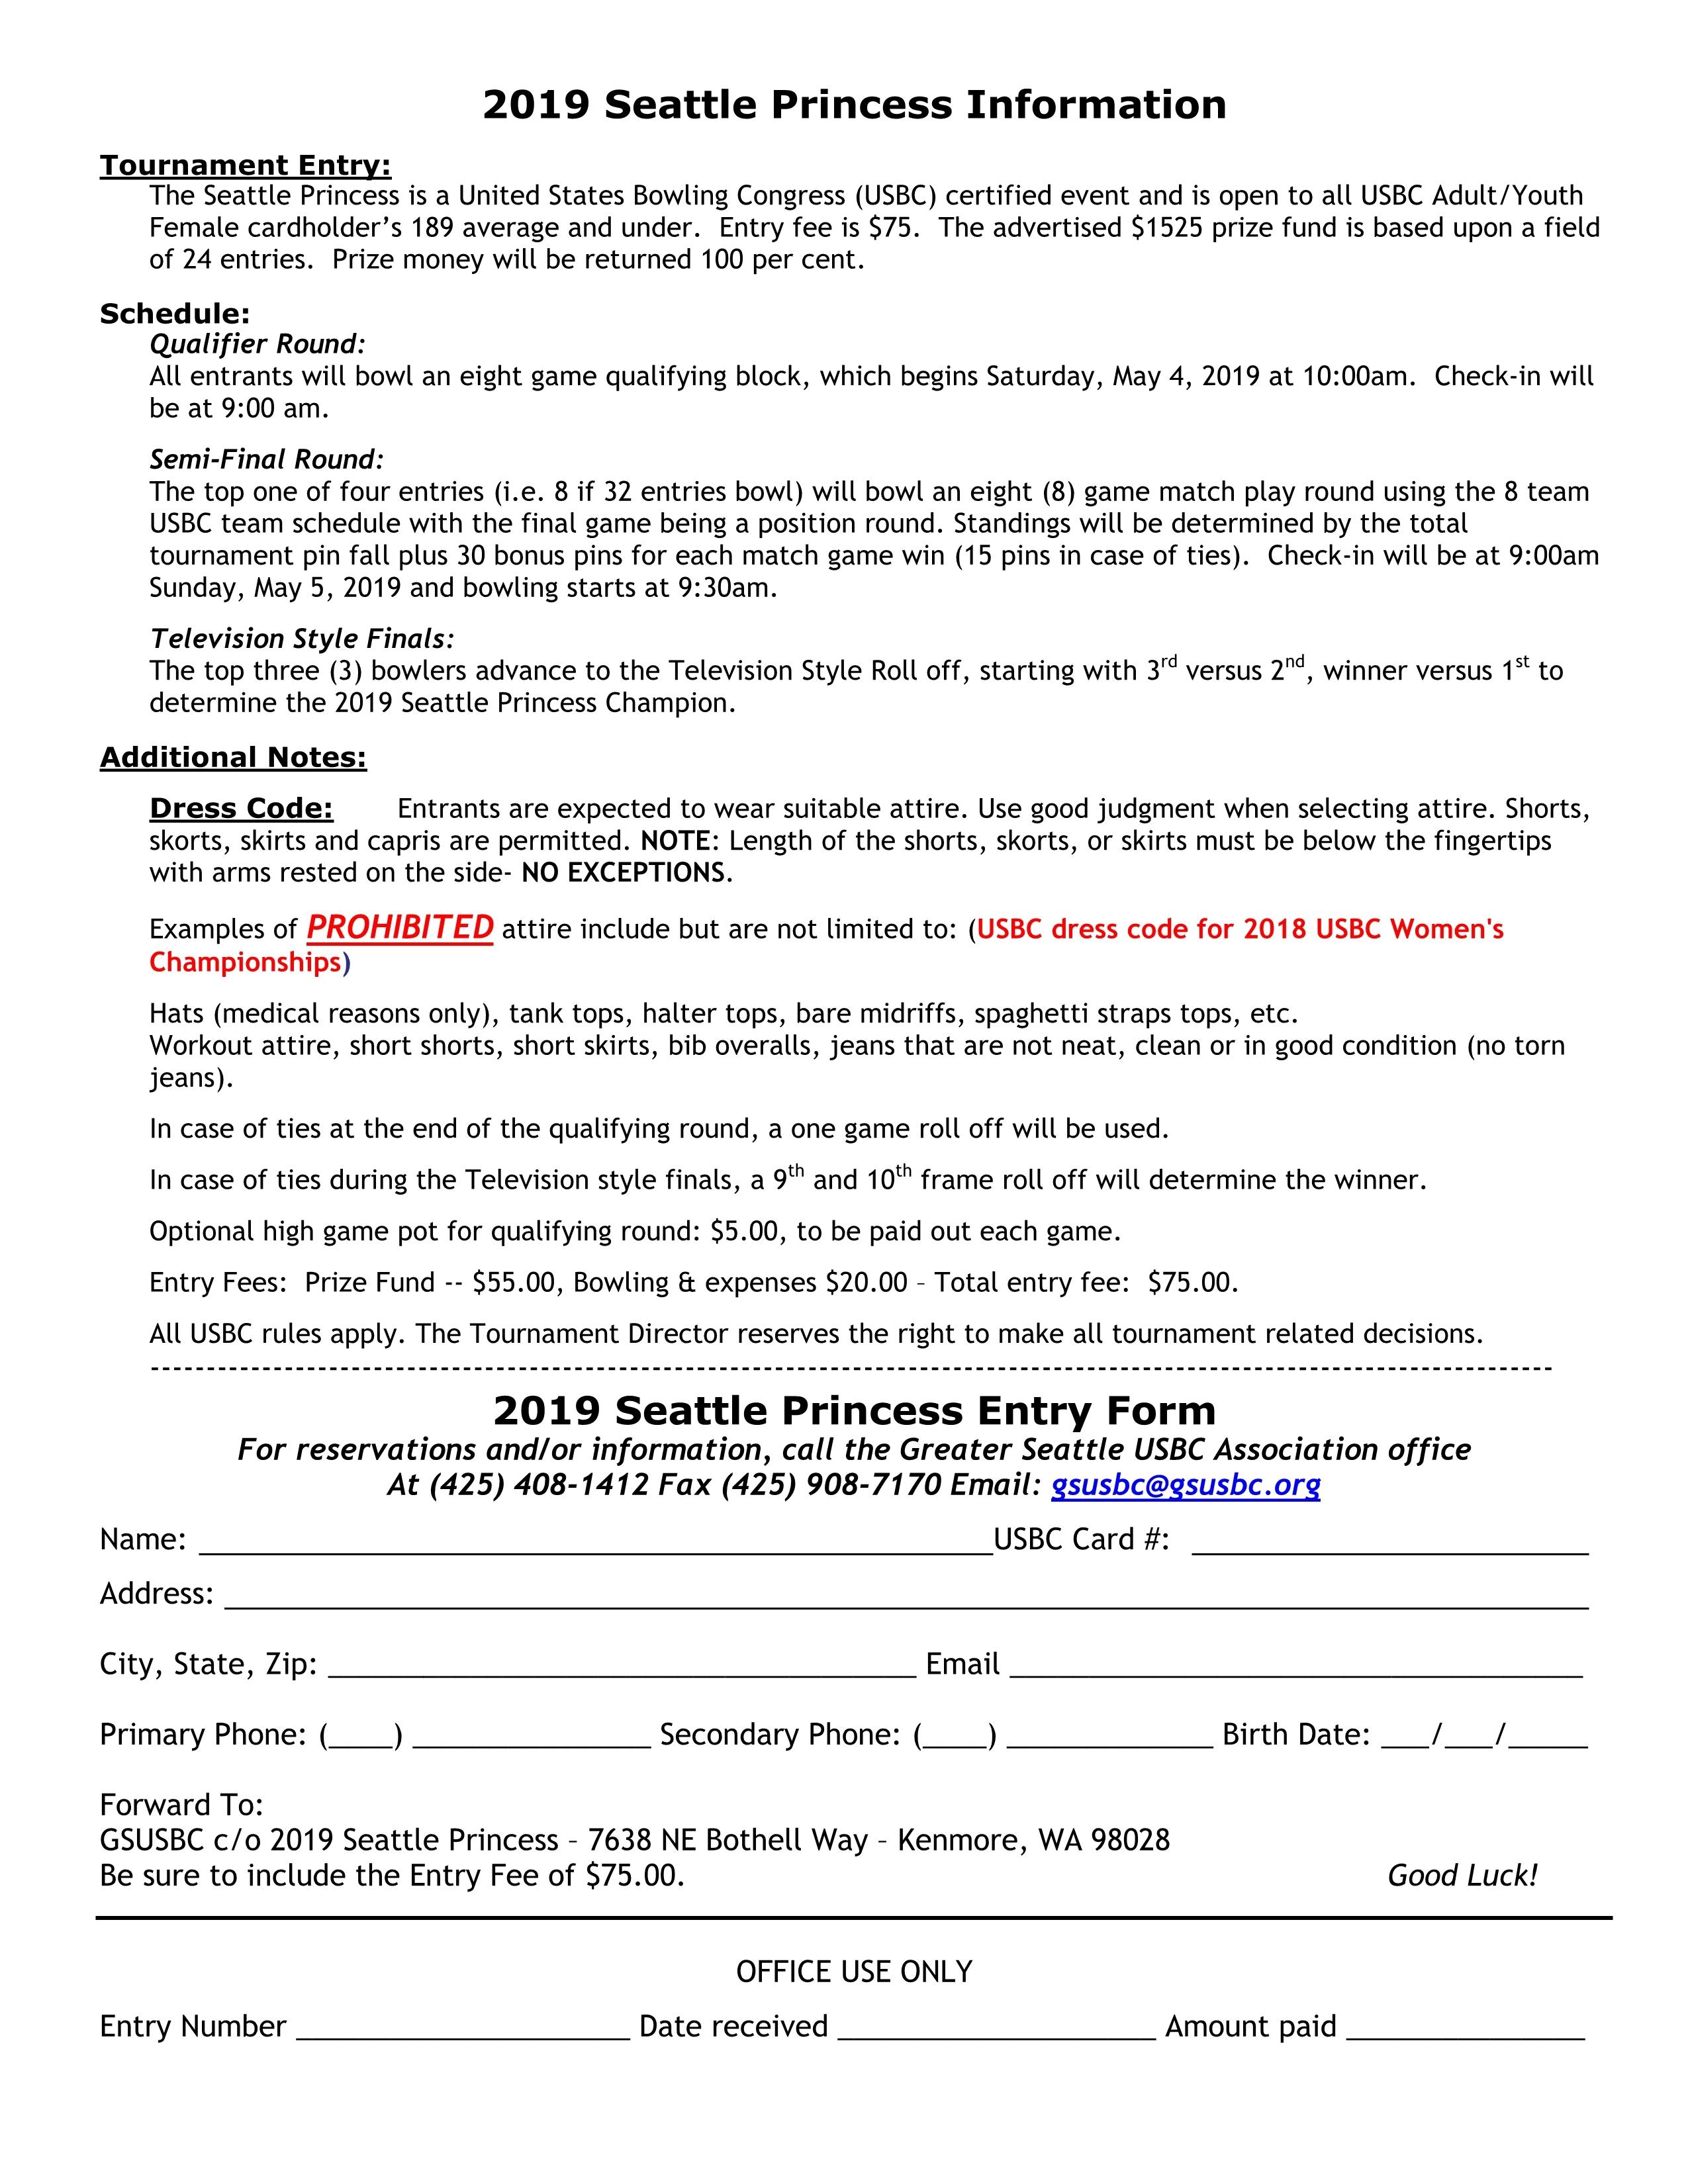 Seattle Princess Tournament